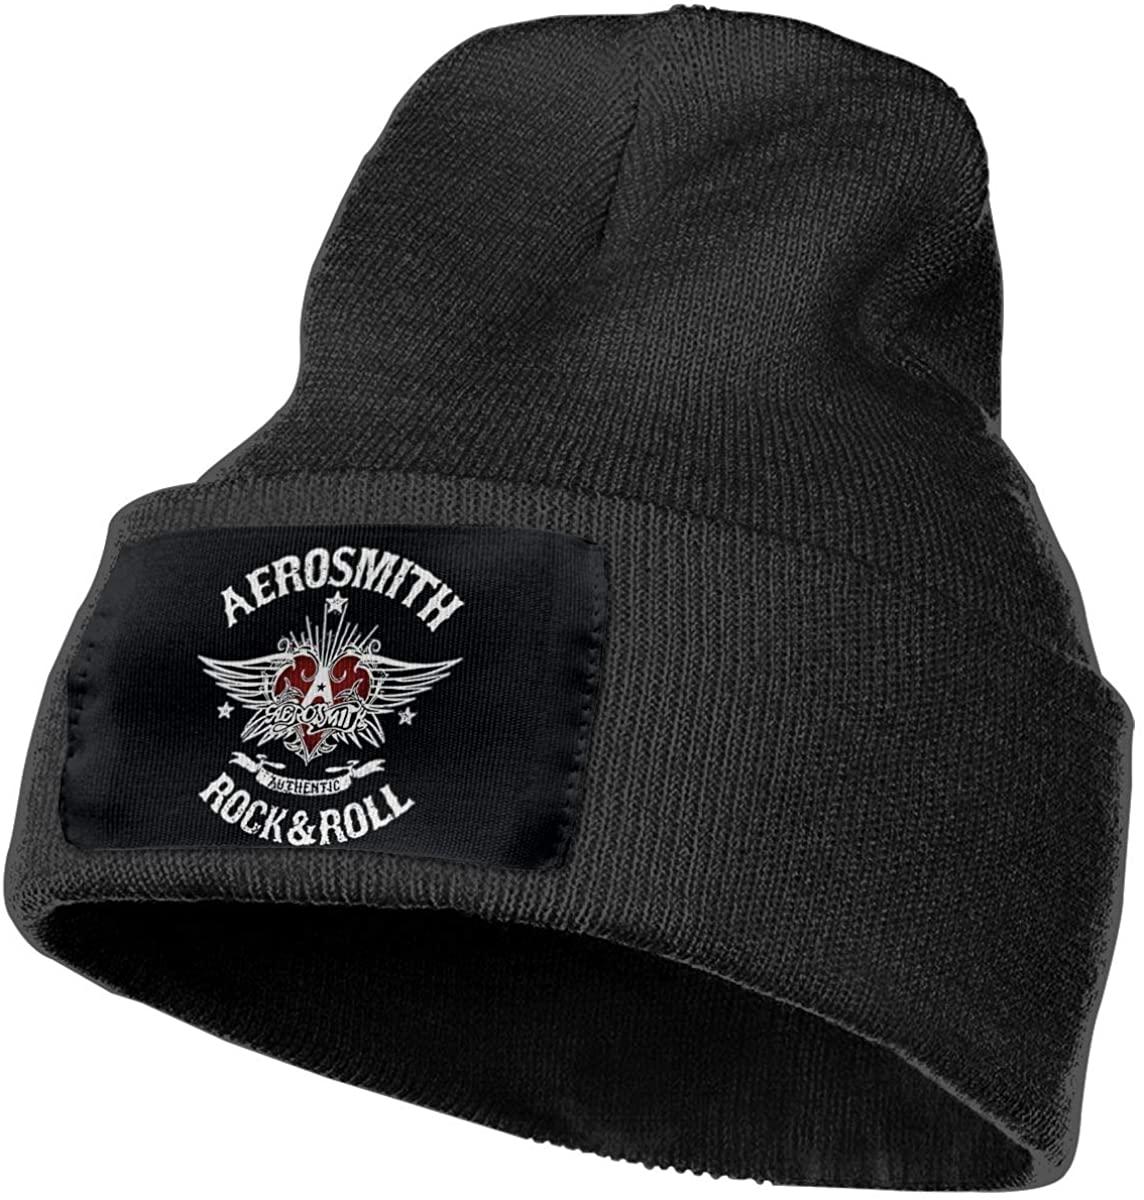 Aerosmith Knitted Hat Keeps Warm in Winter, Unisex